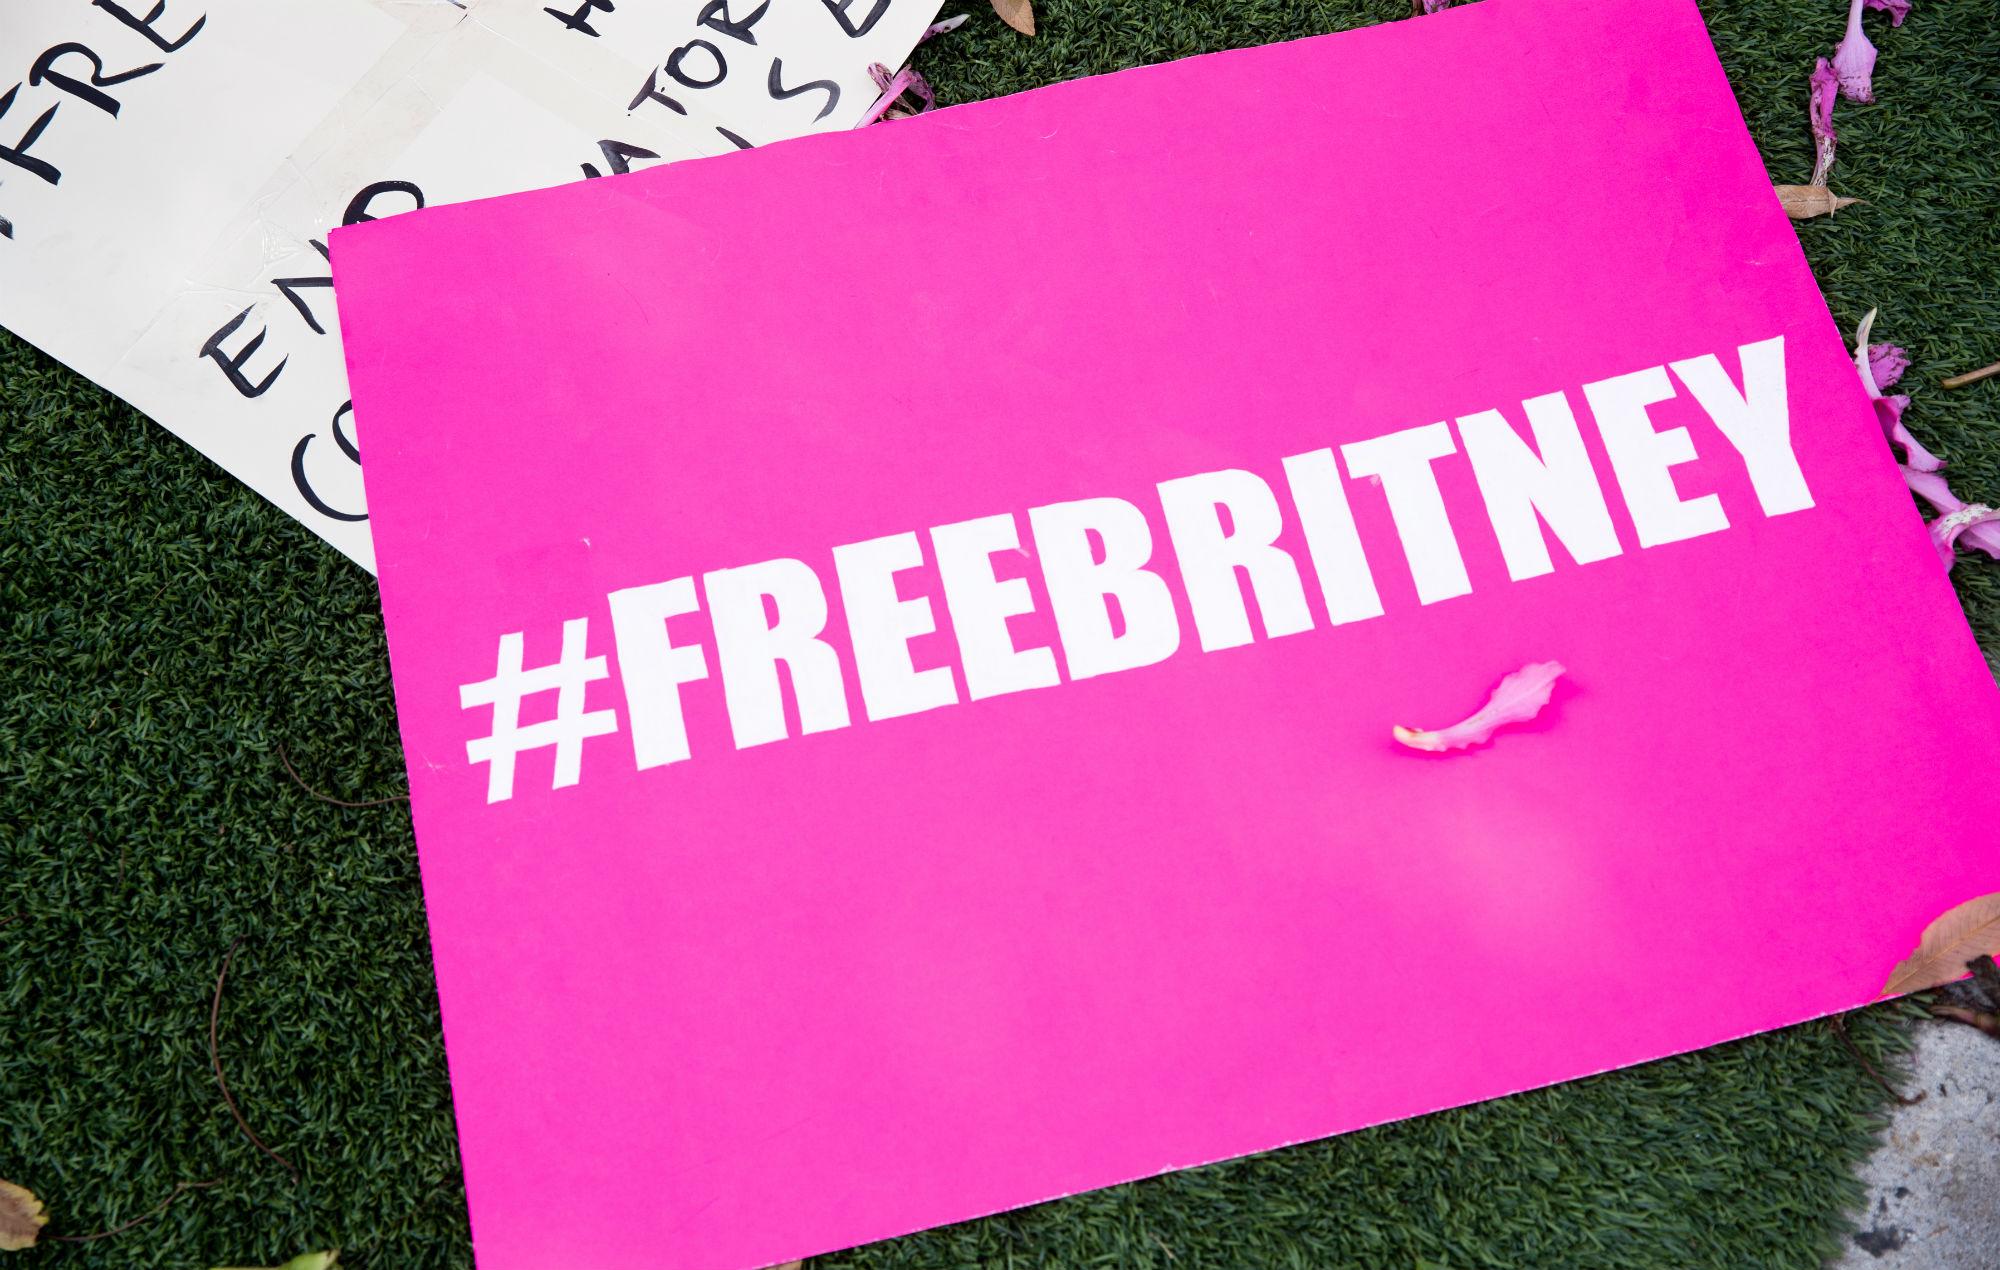 britney spears #freebritney